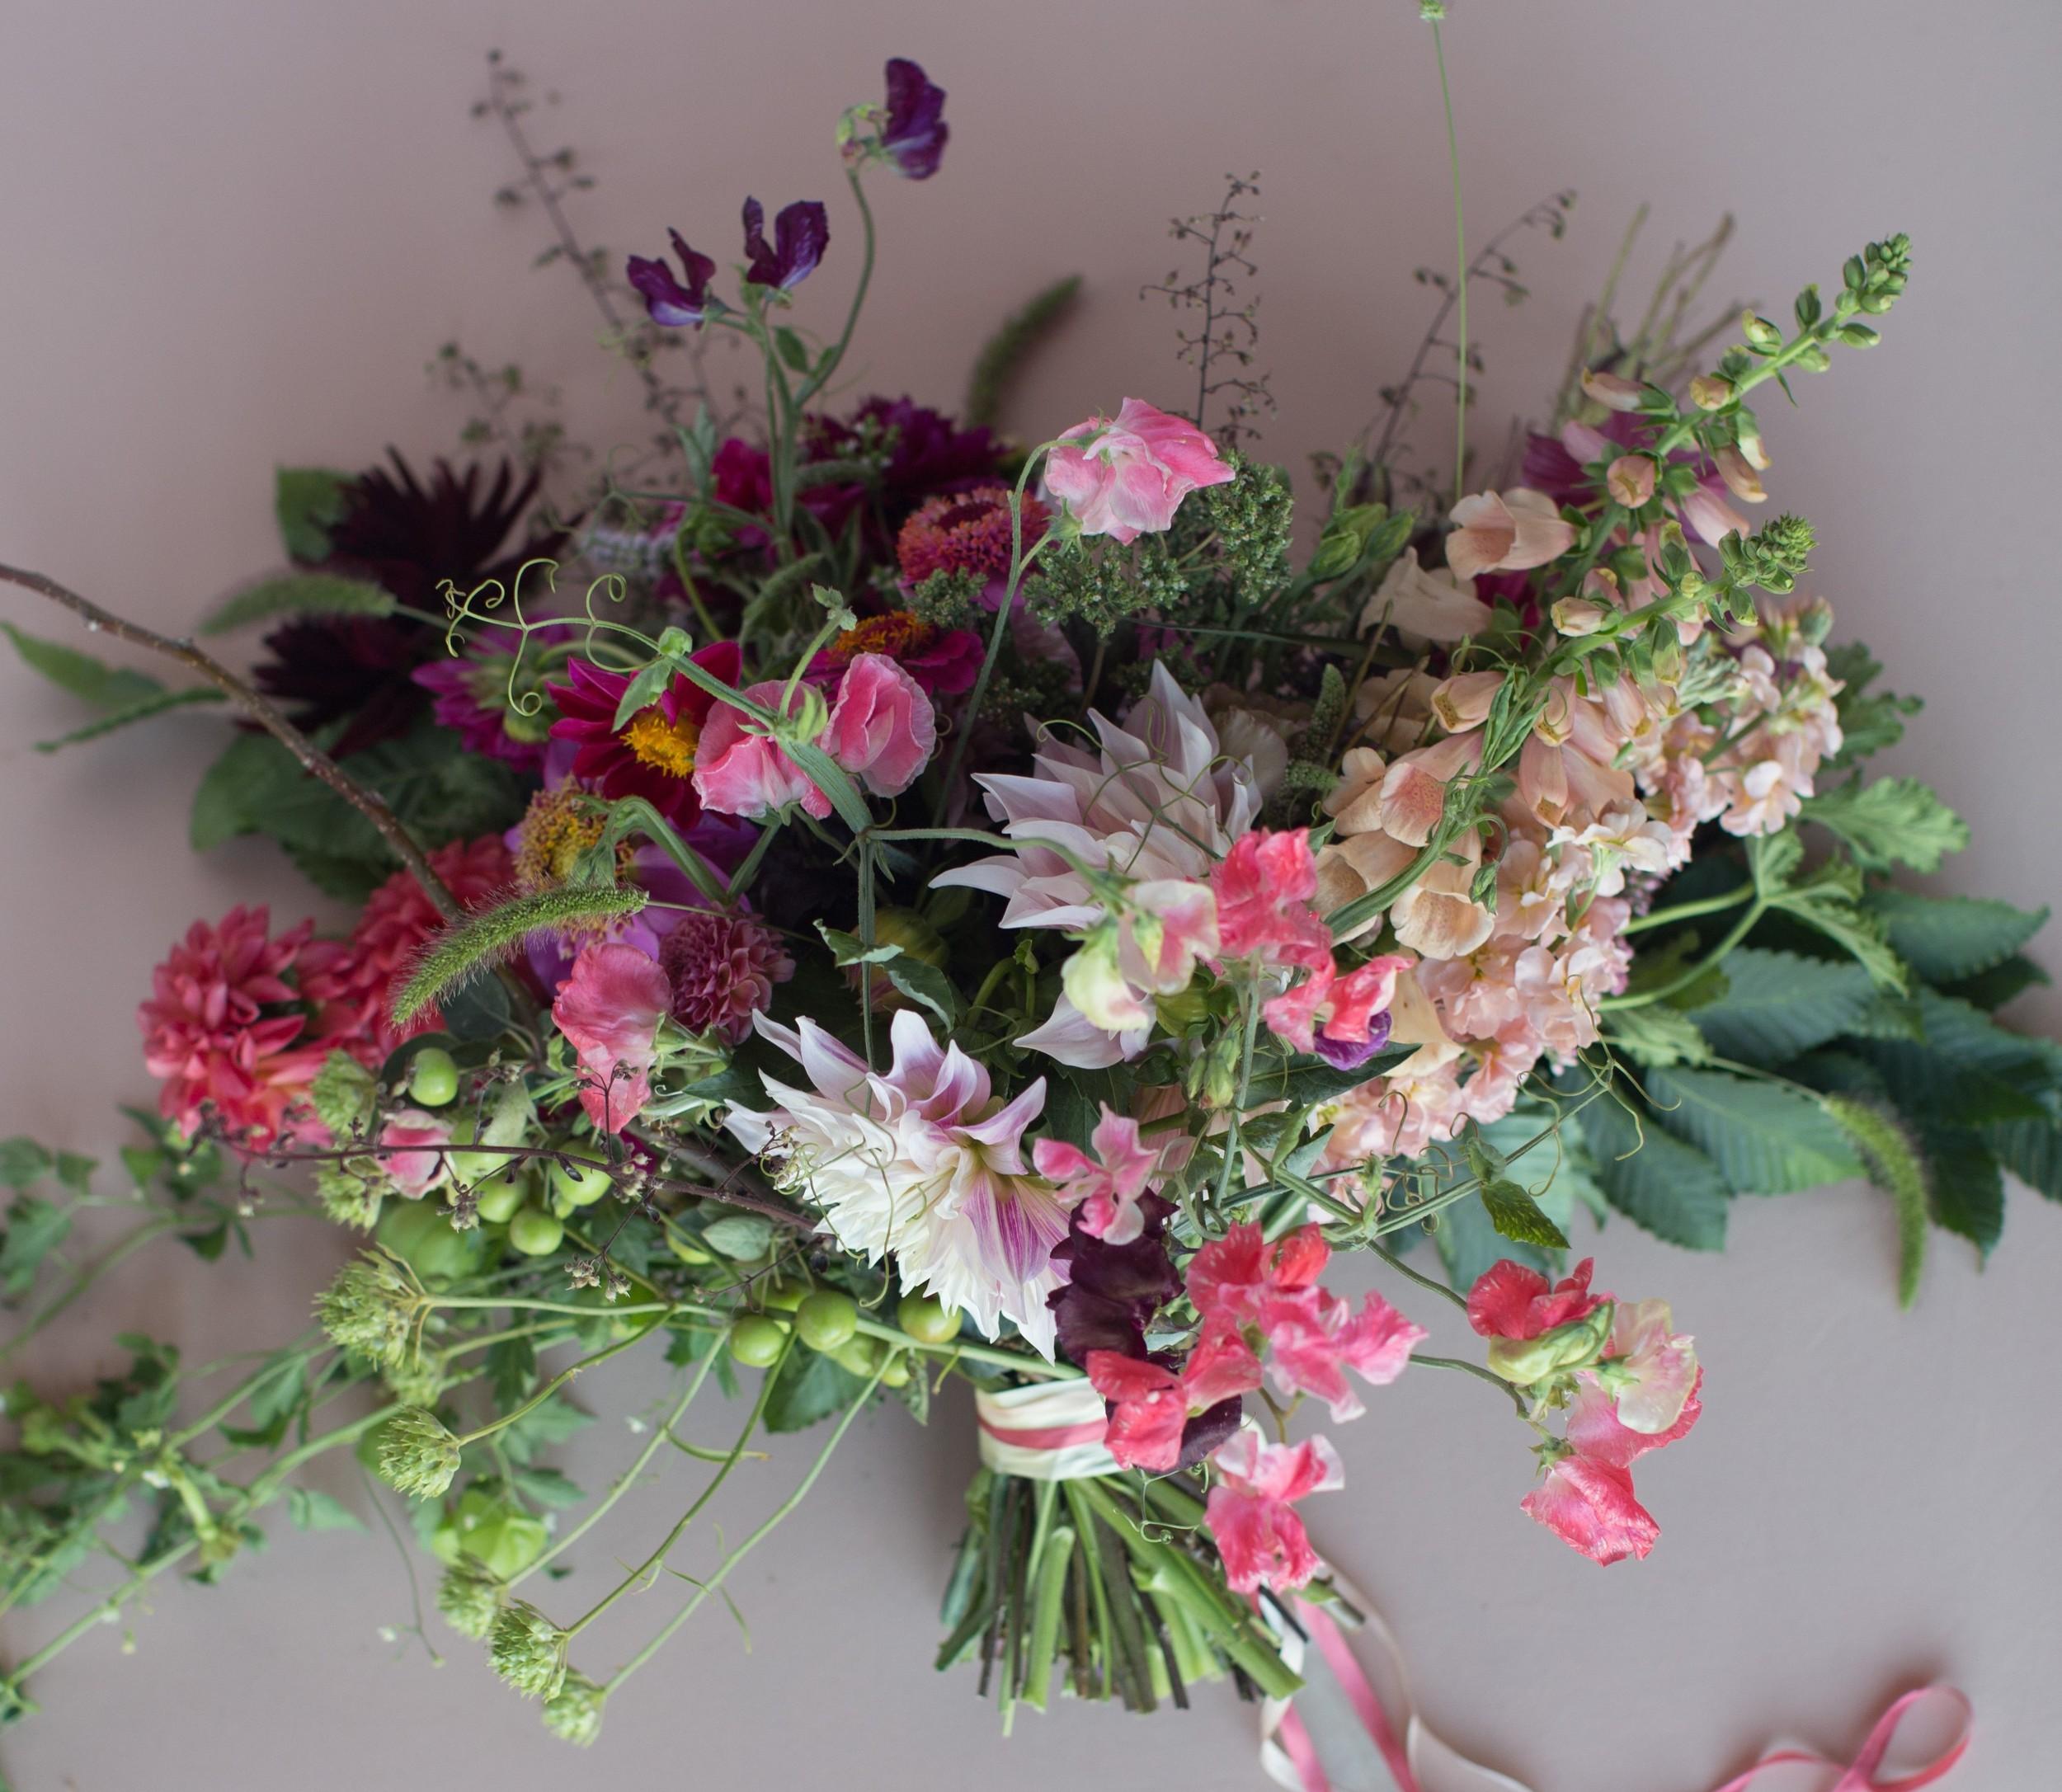 Chris Benzakein, Floret Flowers